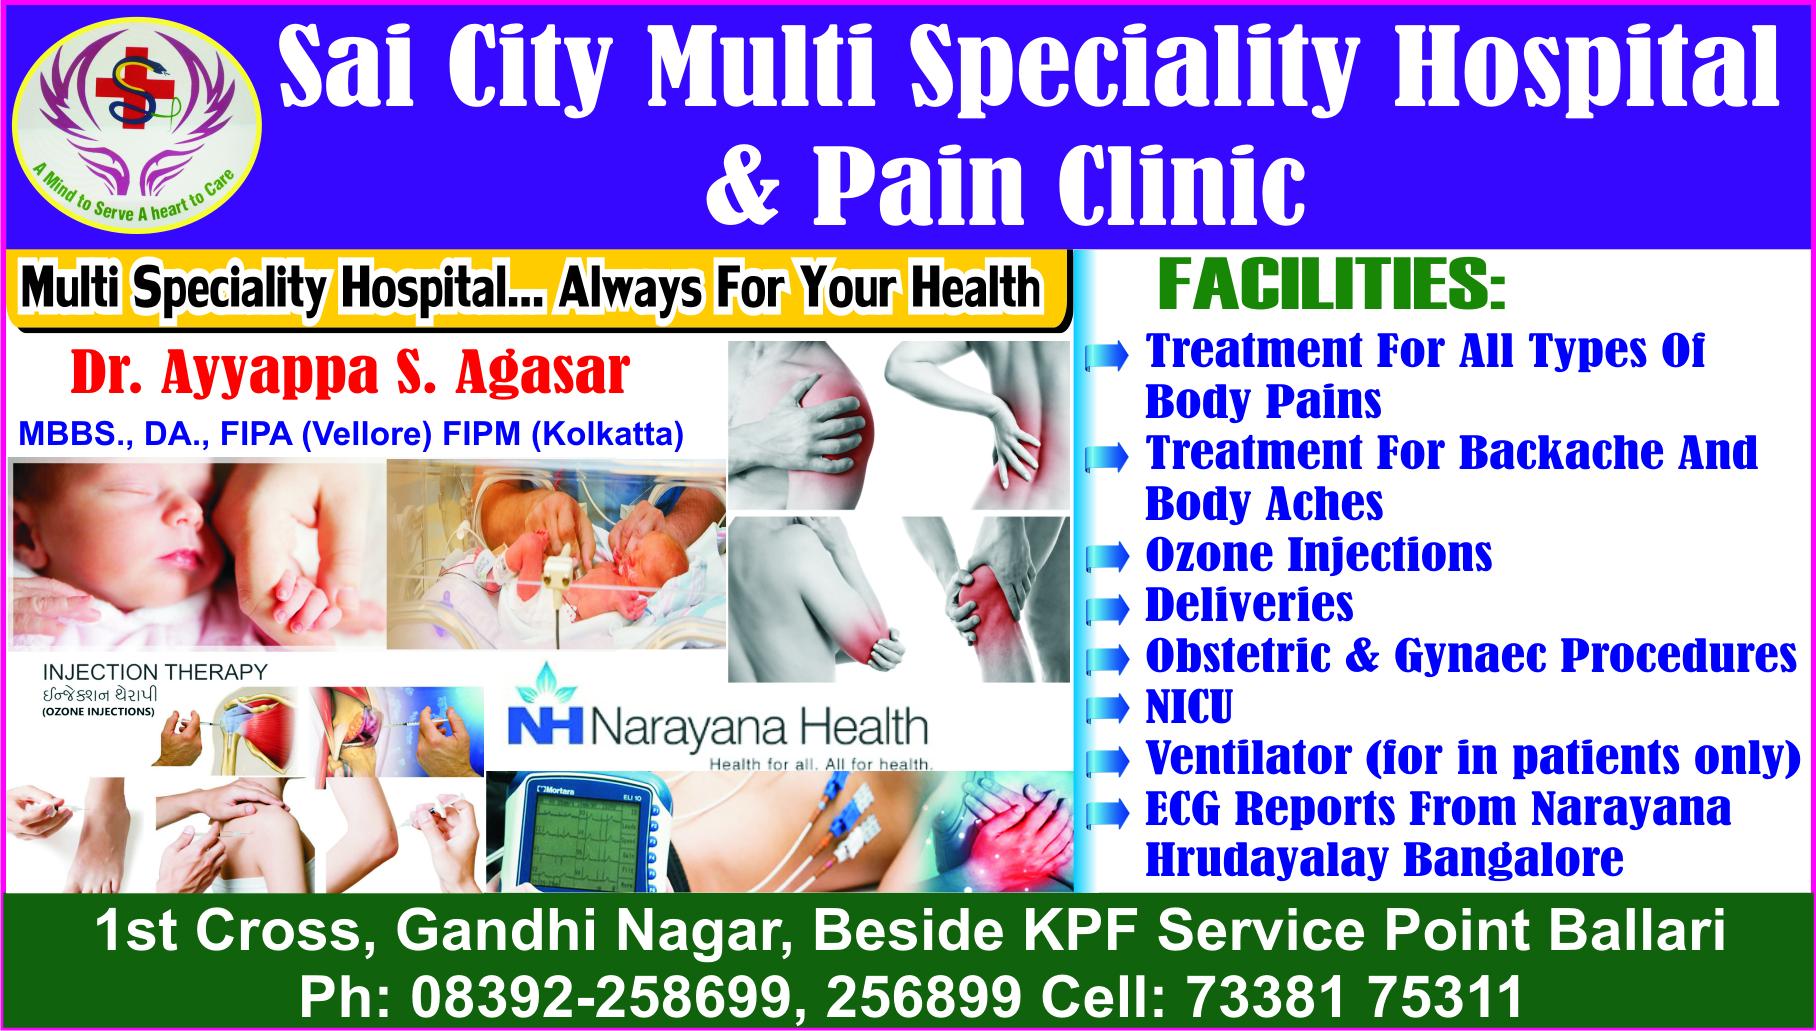 Sai City Multi Speciality Hospital & Pain Clinic